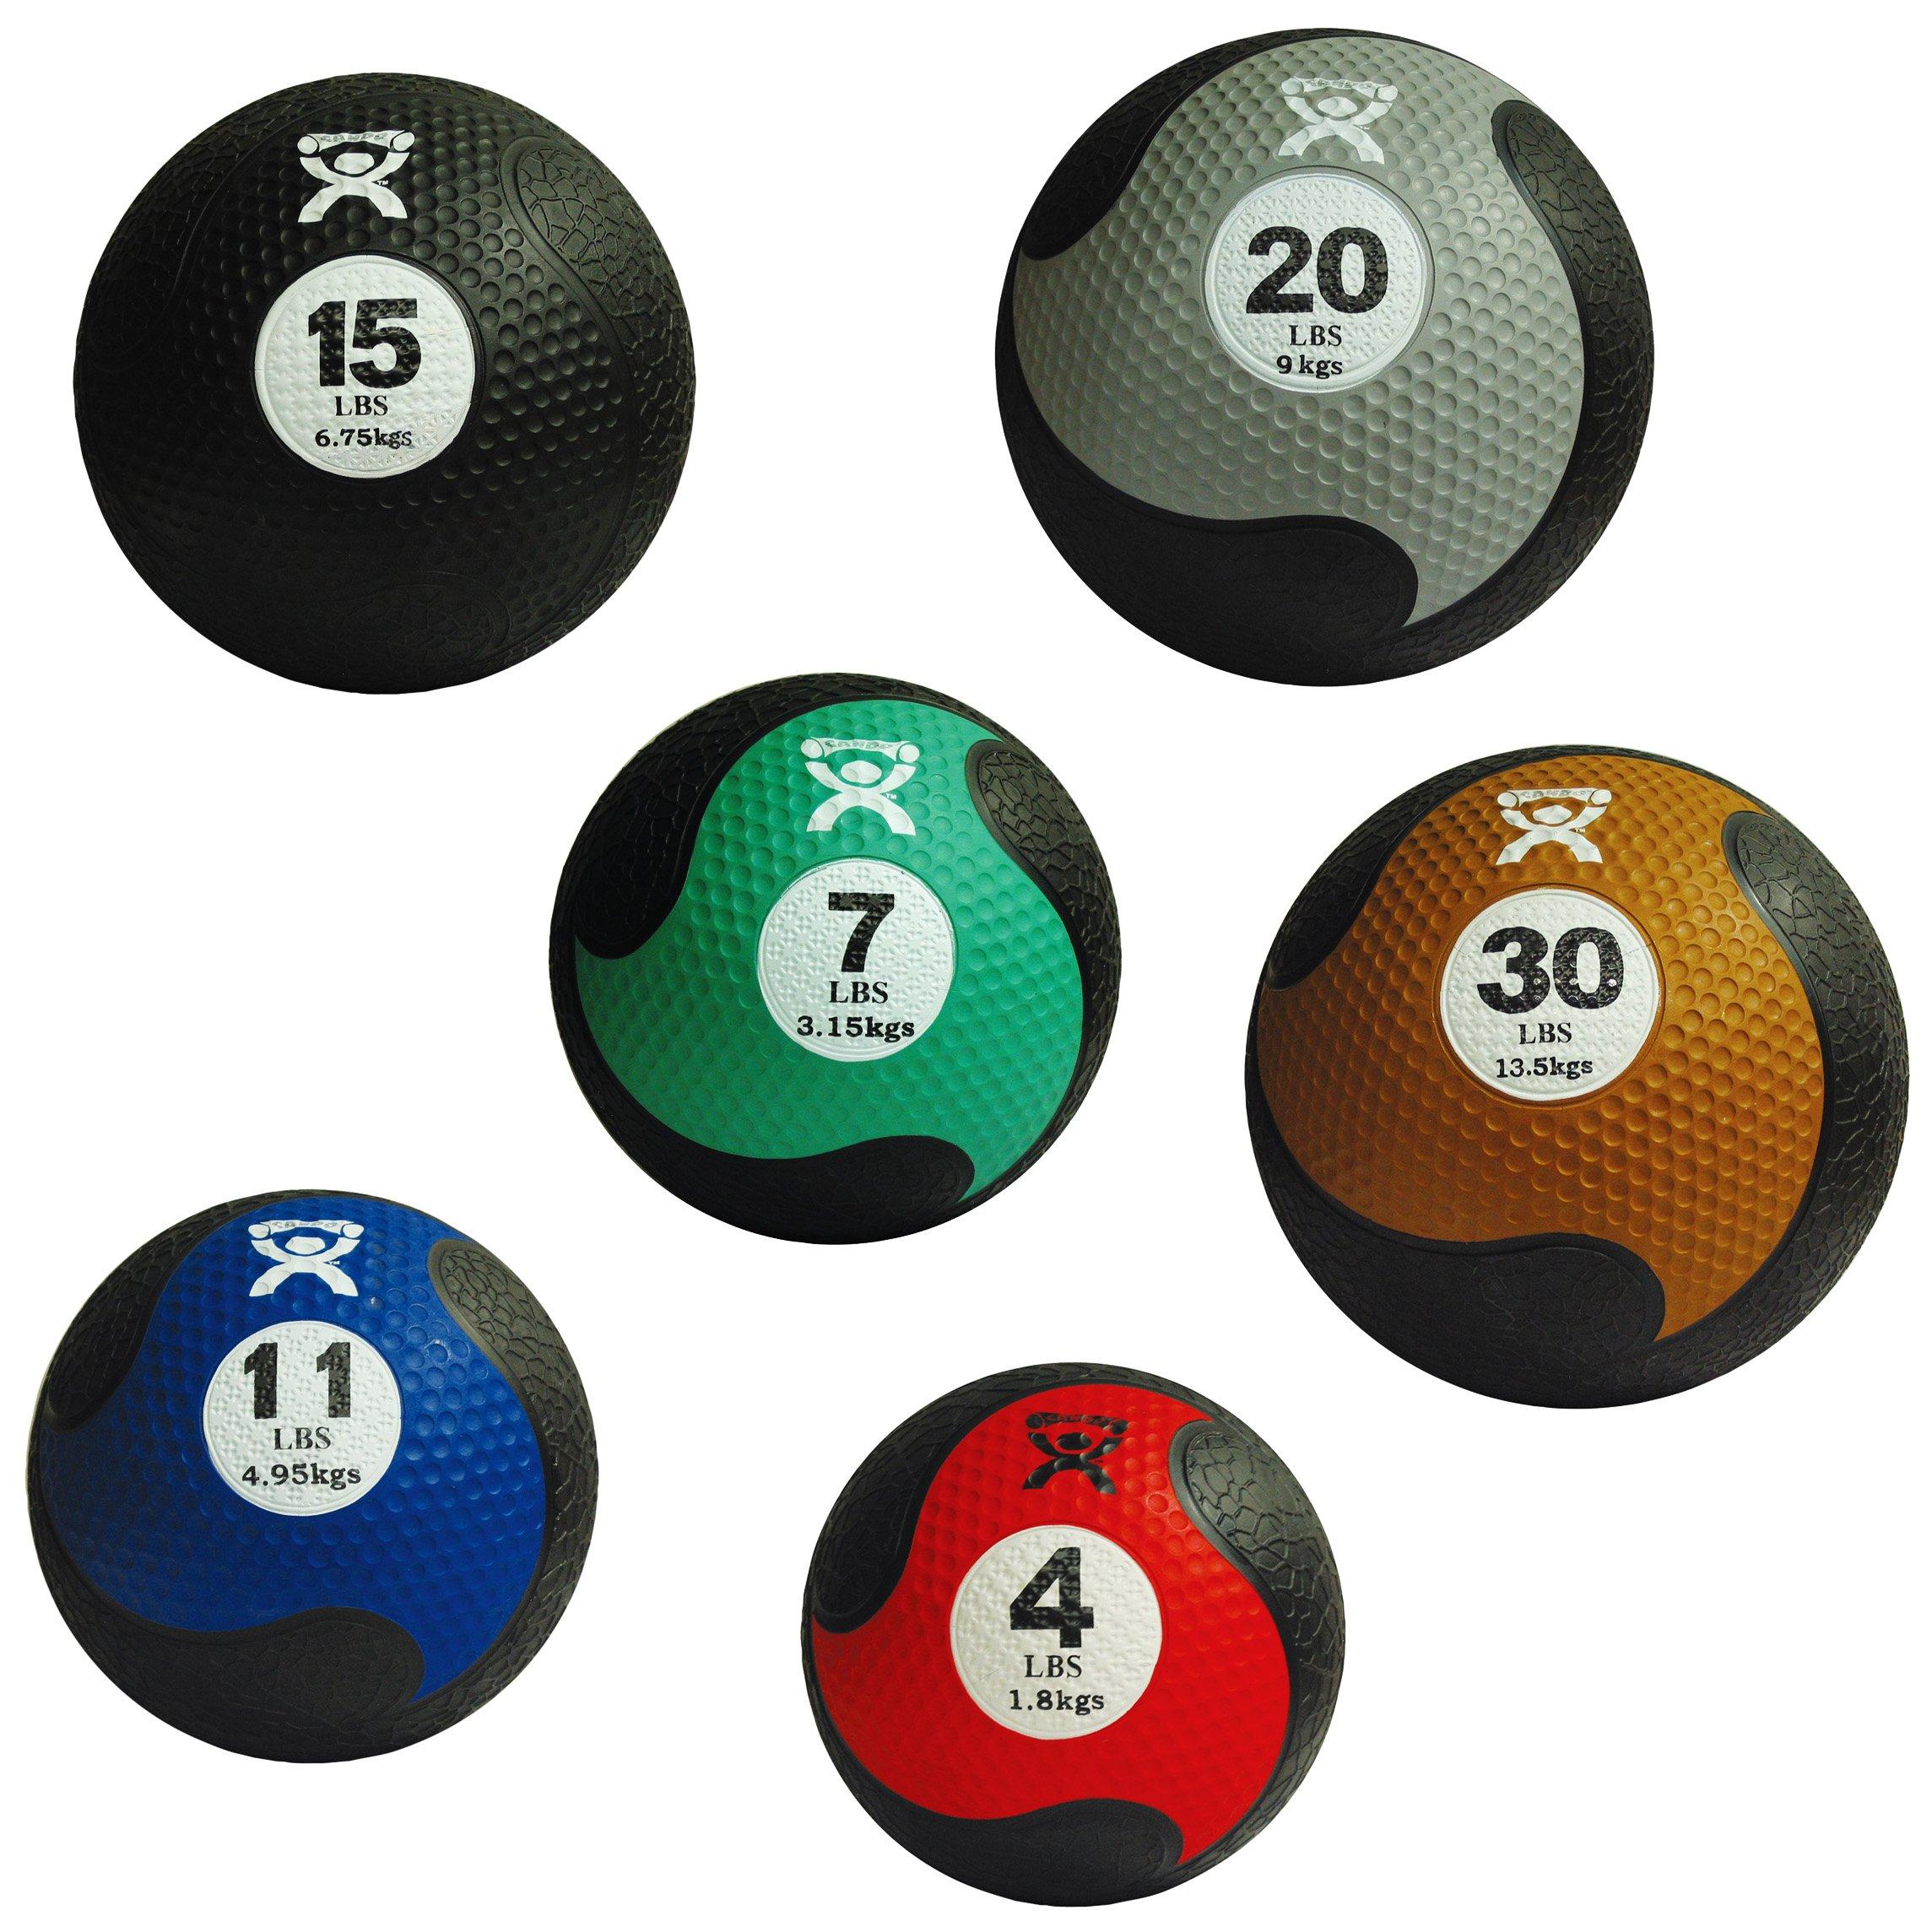 Cando Firm Fitness Medicine Balls - 6-Piece Bundle - 1 Each: 4, 7, 11, 15, 20, 30 LB by Cando (Image #1)